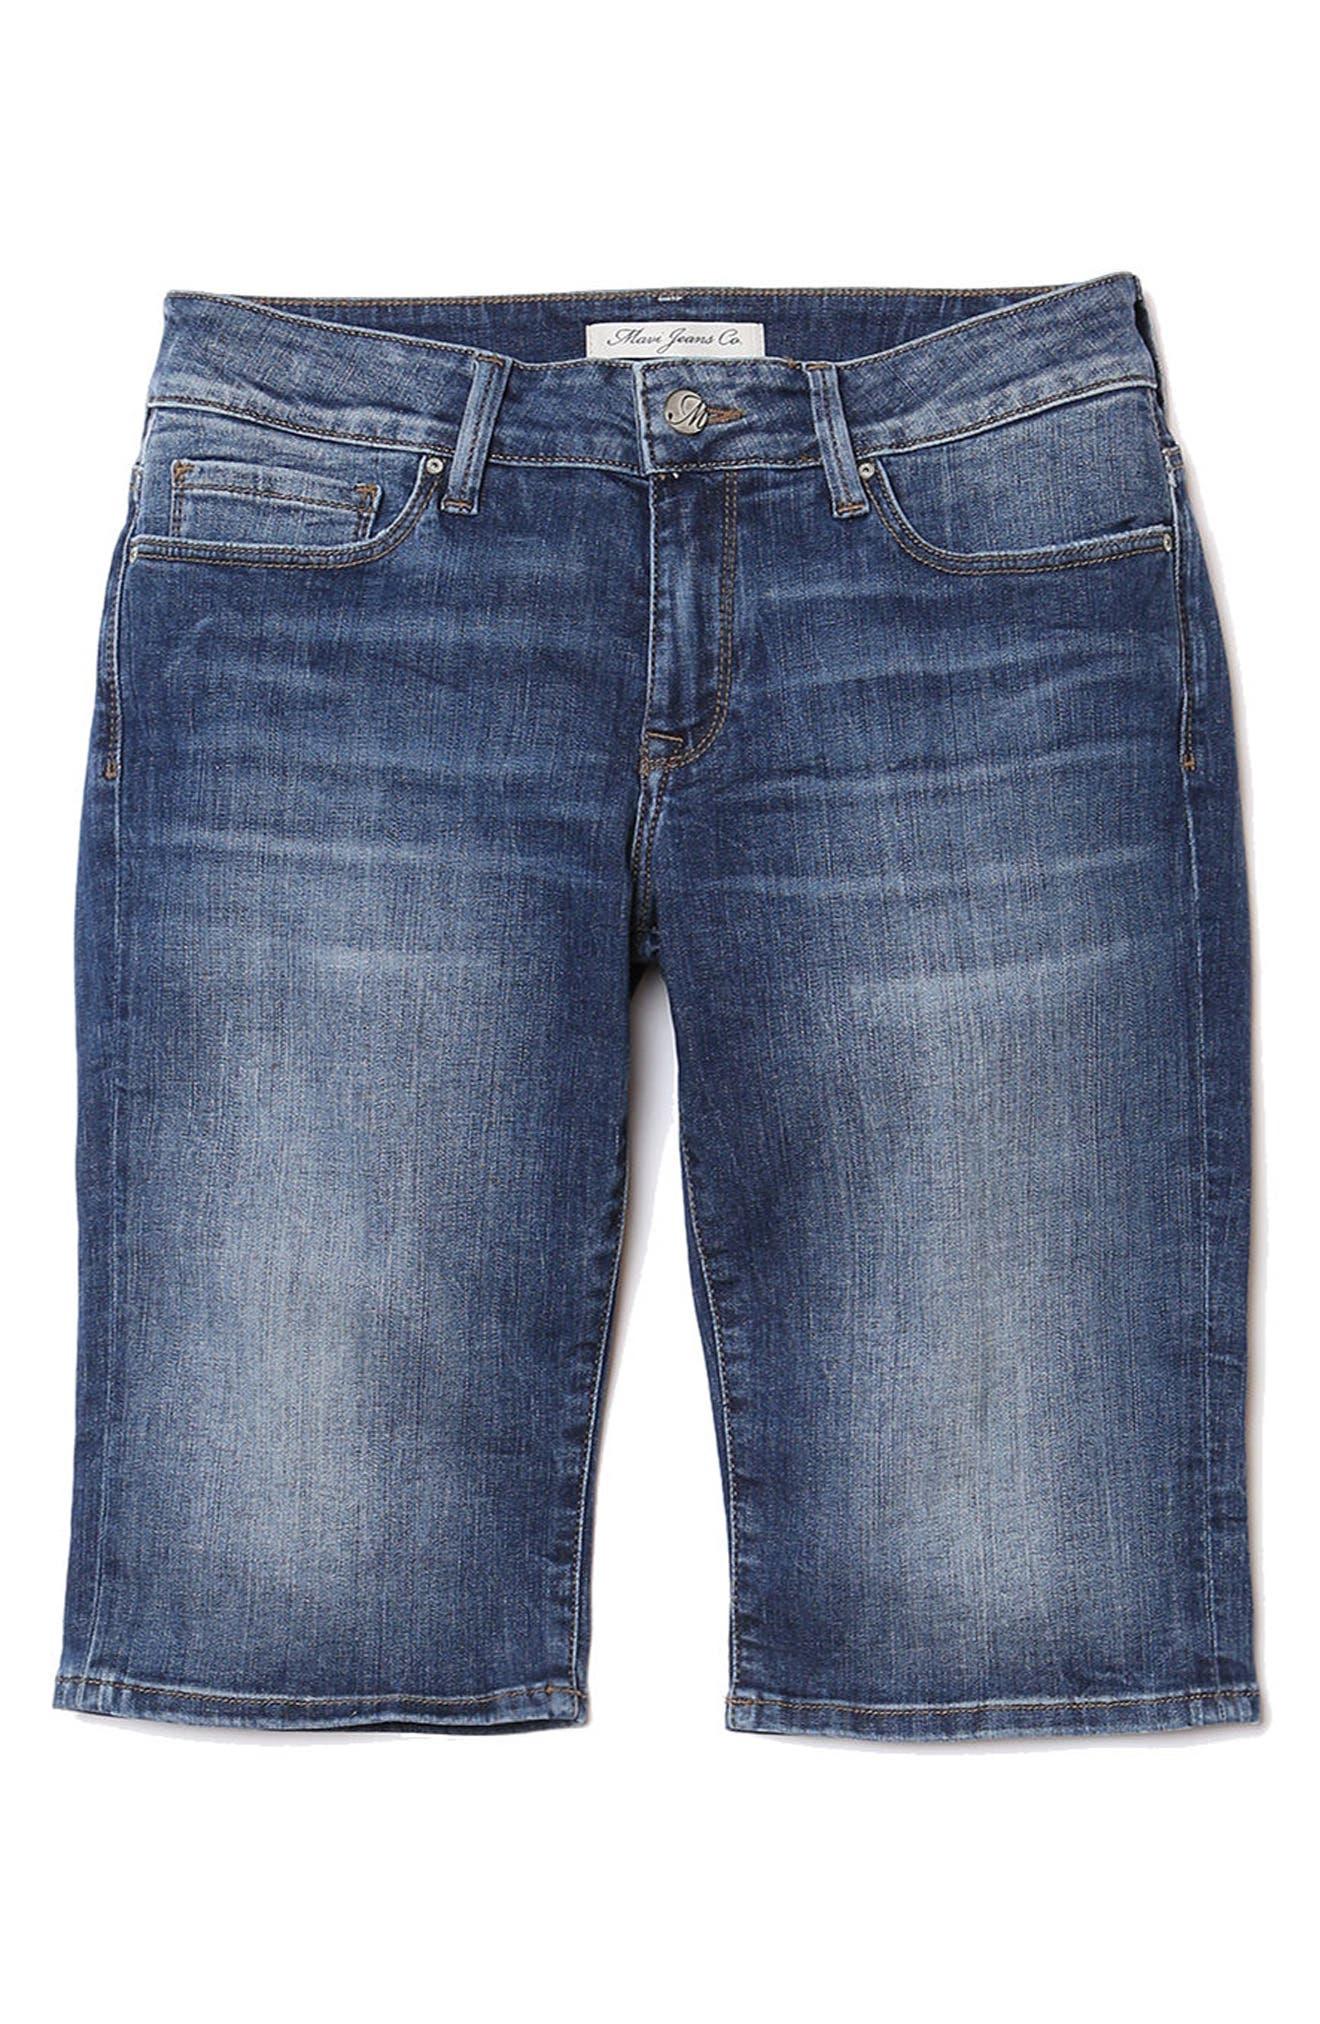 Karly Bermuda Shorts,                             Alternate thumbnail 5, color,                             Dark Indigo Tribeca